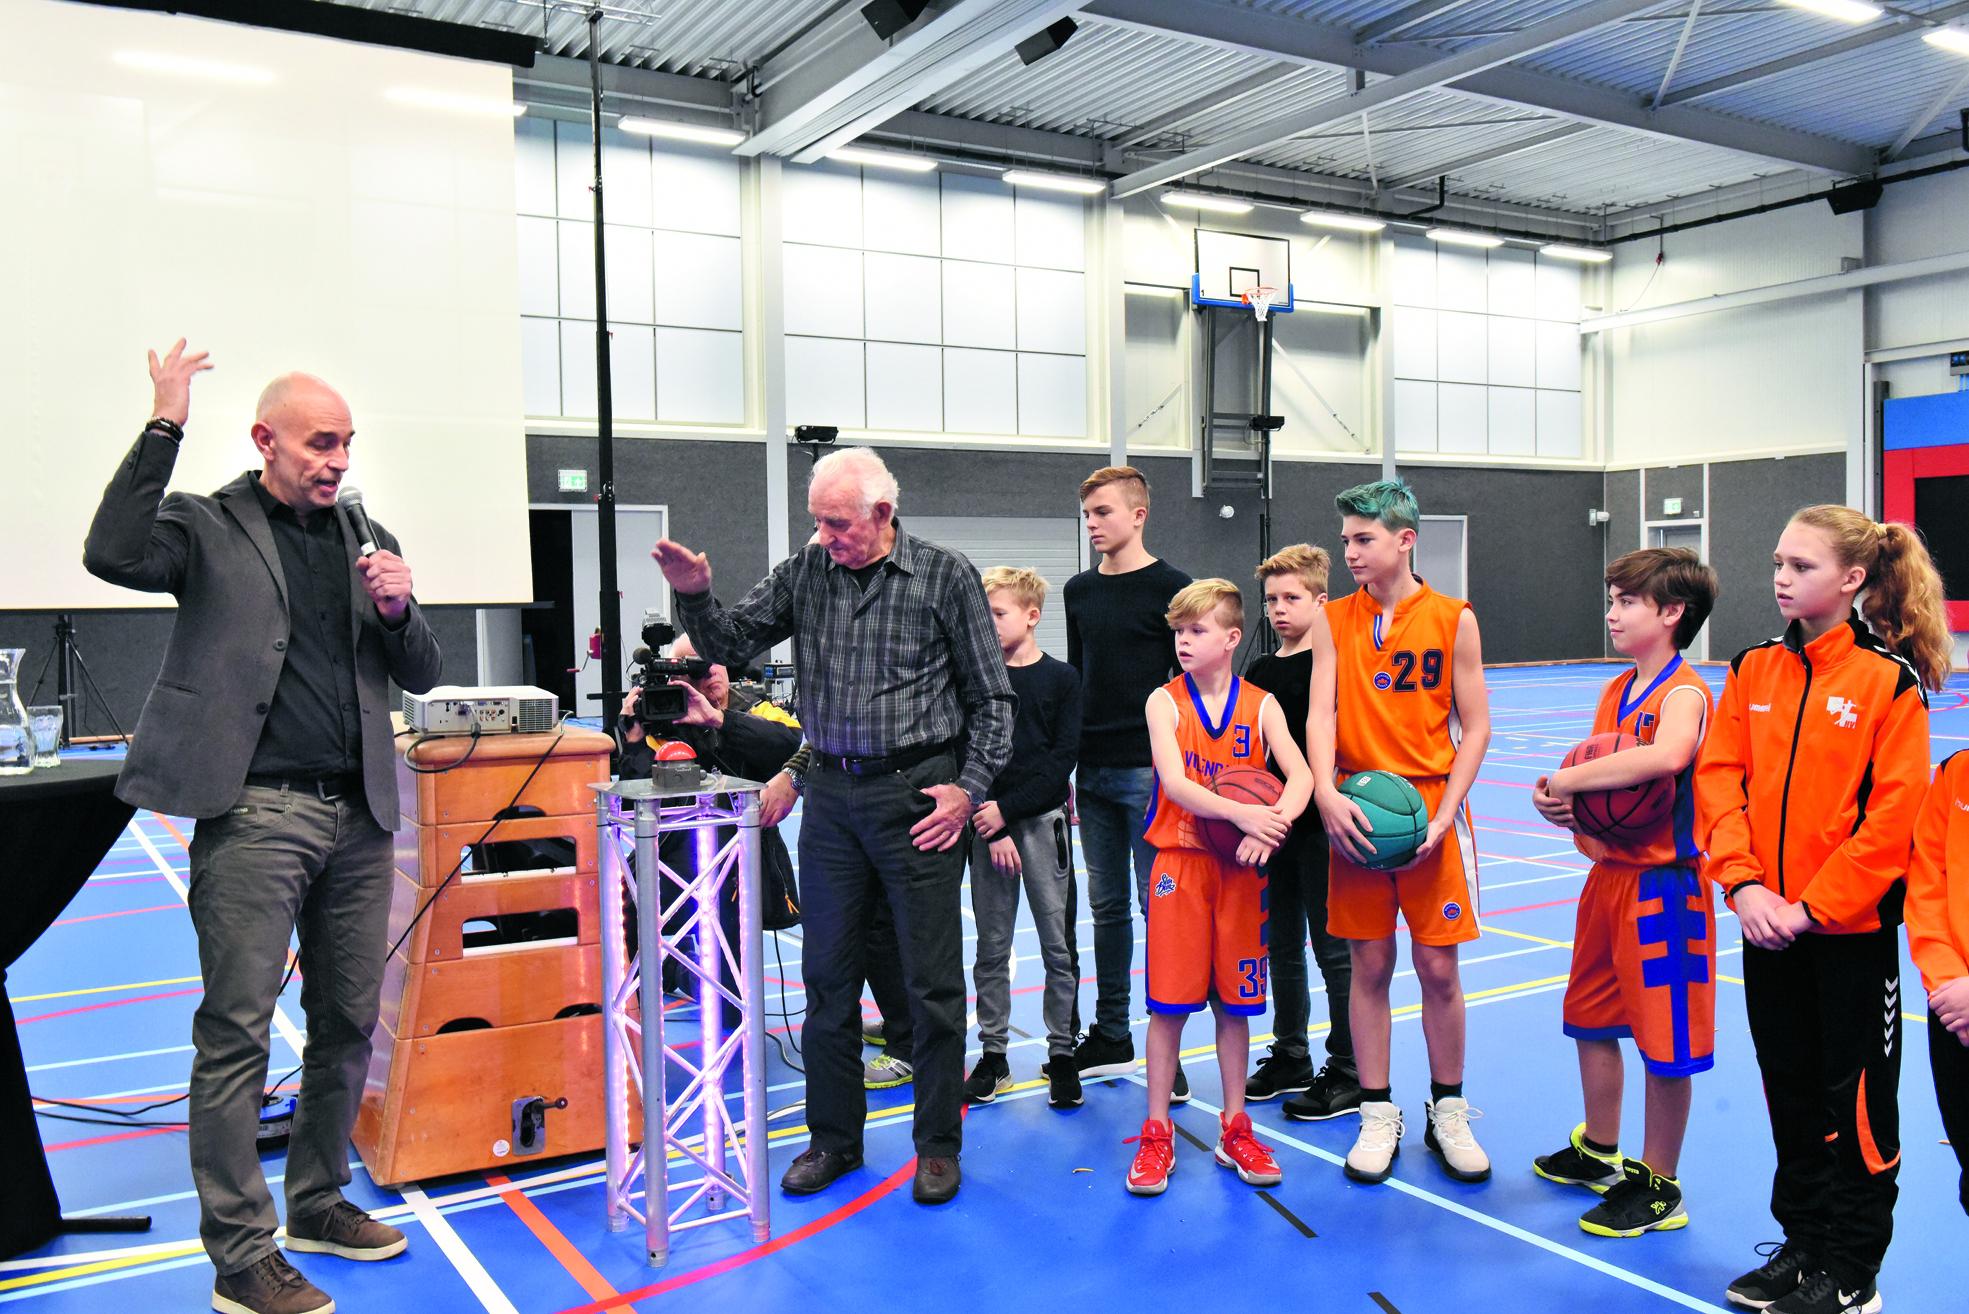 Sporthal De Seinpaal feestelijk geopend